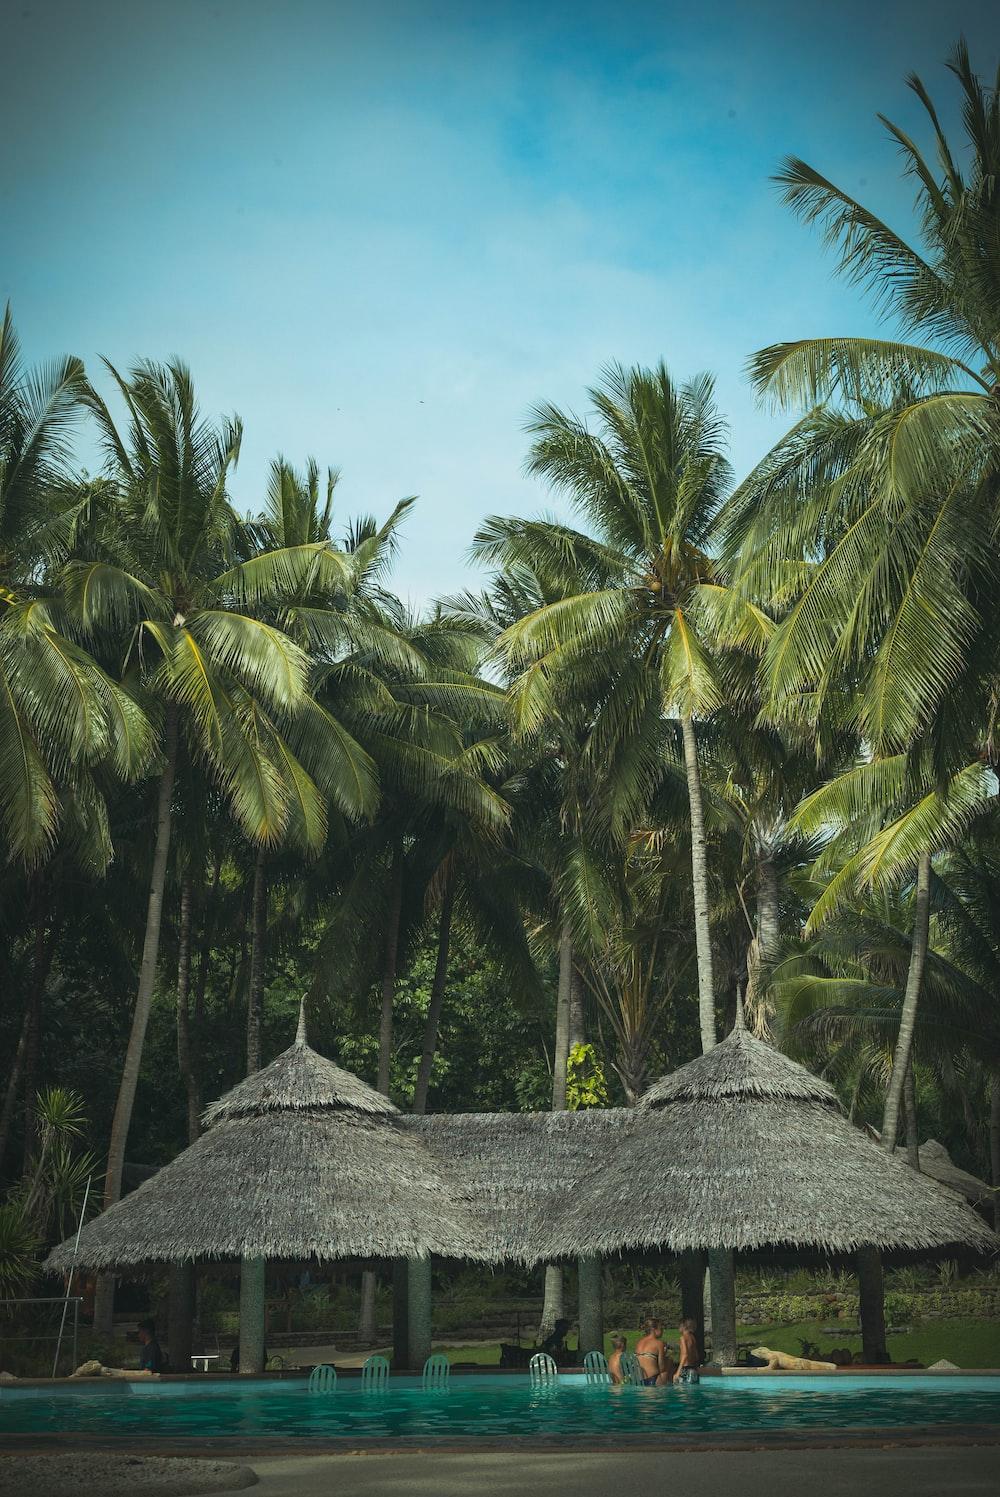 coconut trees near hut